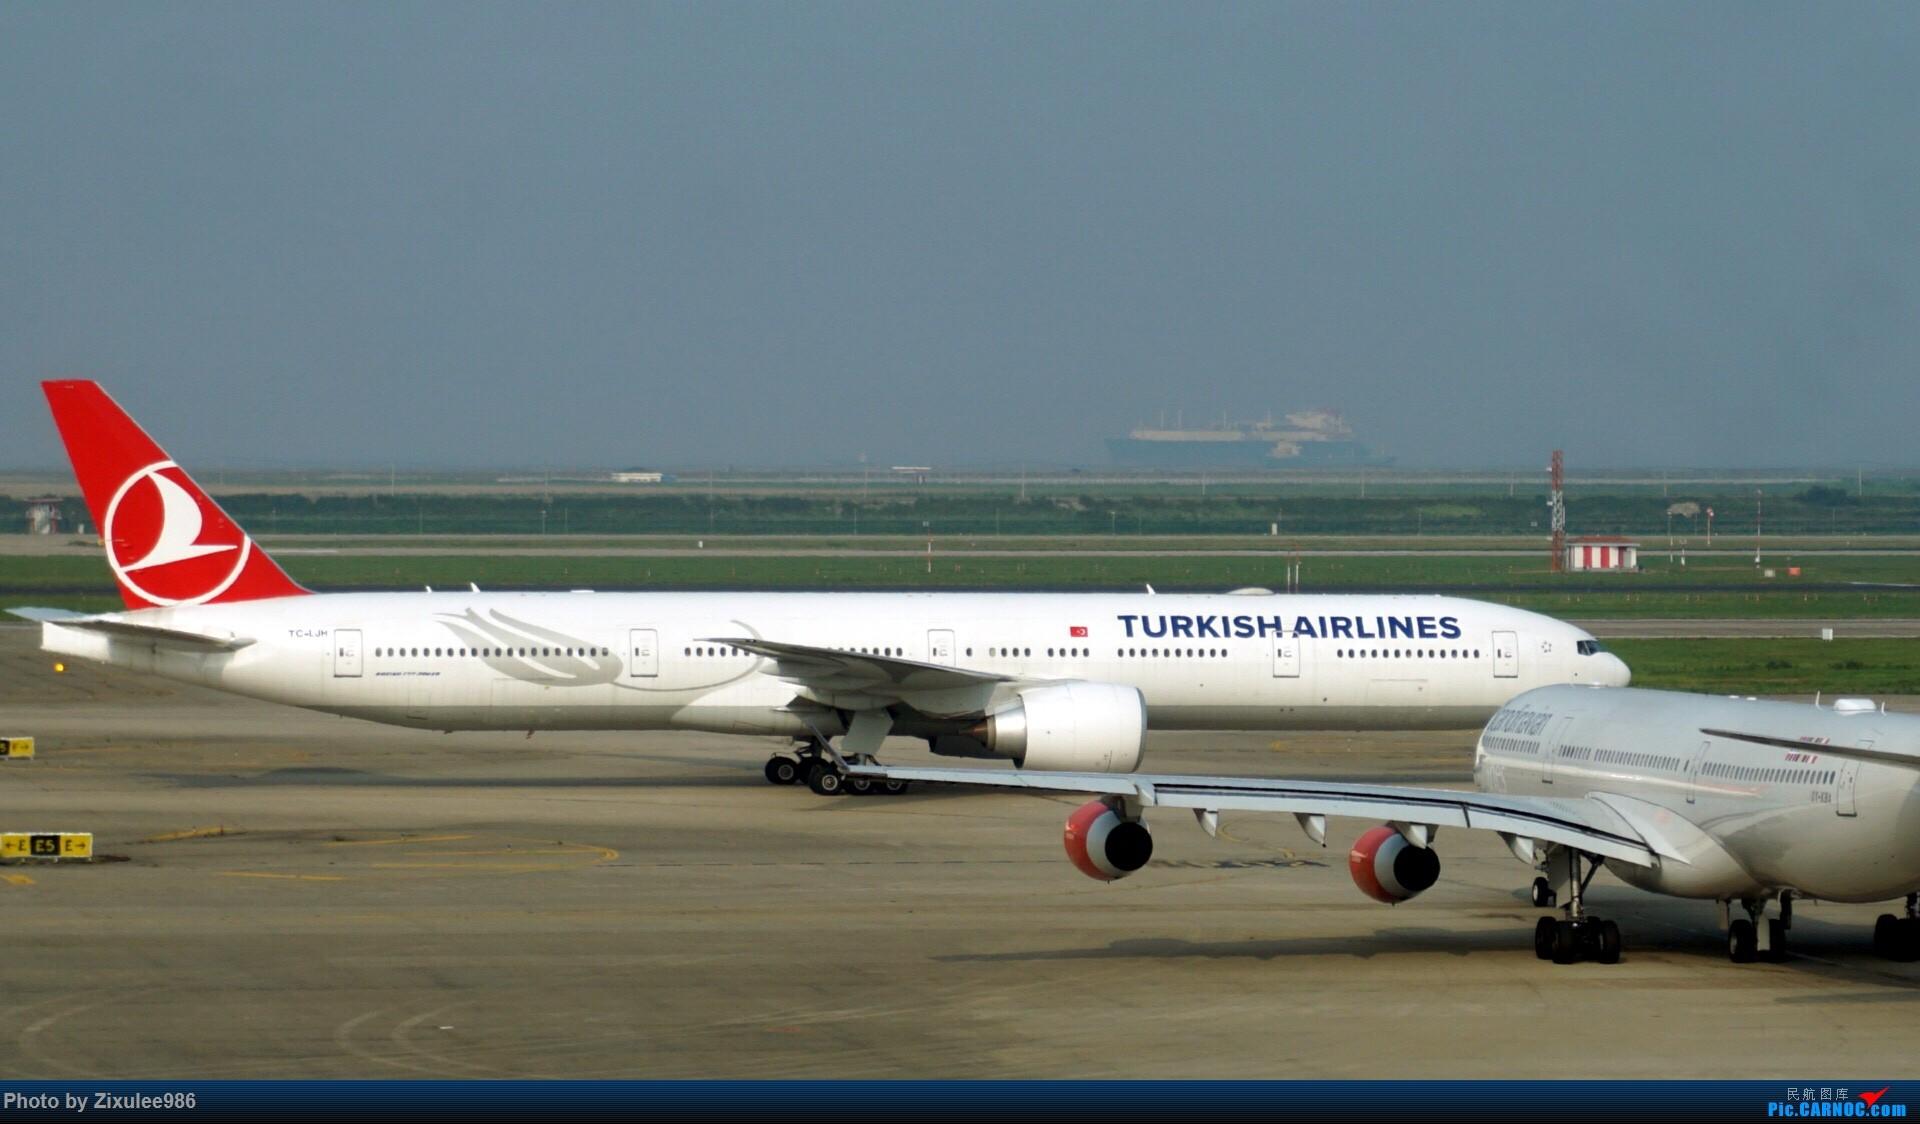 Re:[原创]加拿大21日游学之旅(一)~JJN-PVG-YYZ..(内含flightlog)~第一次发游记~多图缓更请谅解 BOEING 777-300ER TC-JJH 中国上海浦东国际机场